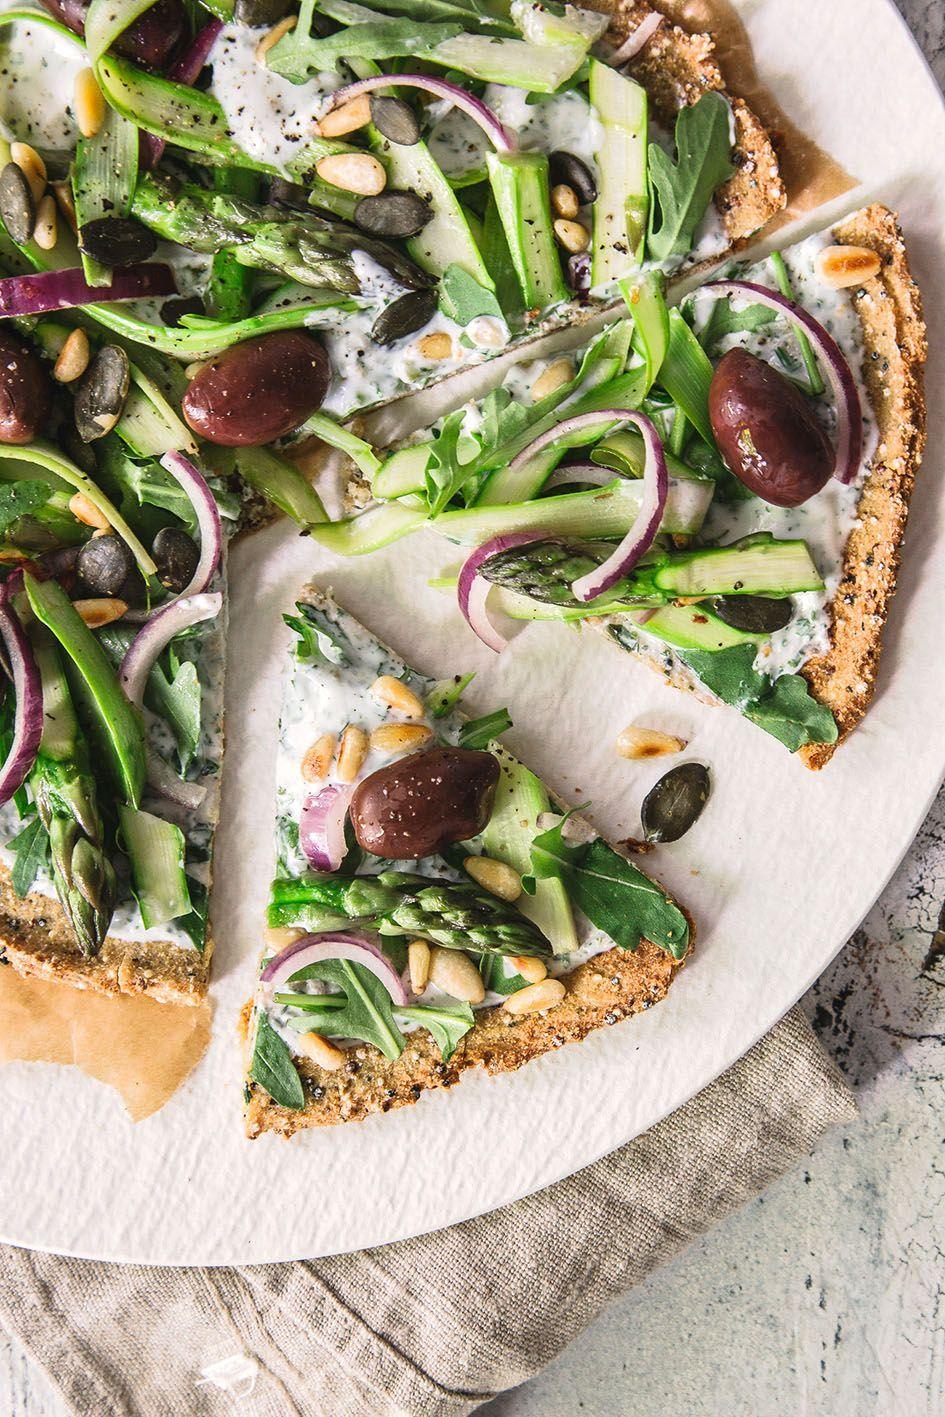 Quinoa pizza dough topped with green asparagus -  Quinoa pizza dough topped with green asparagus  -